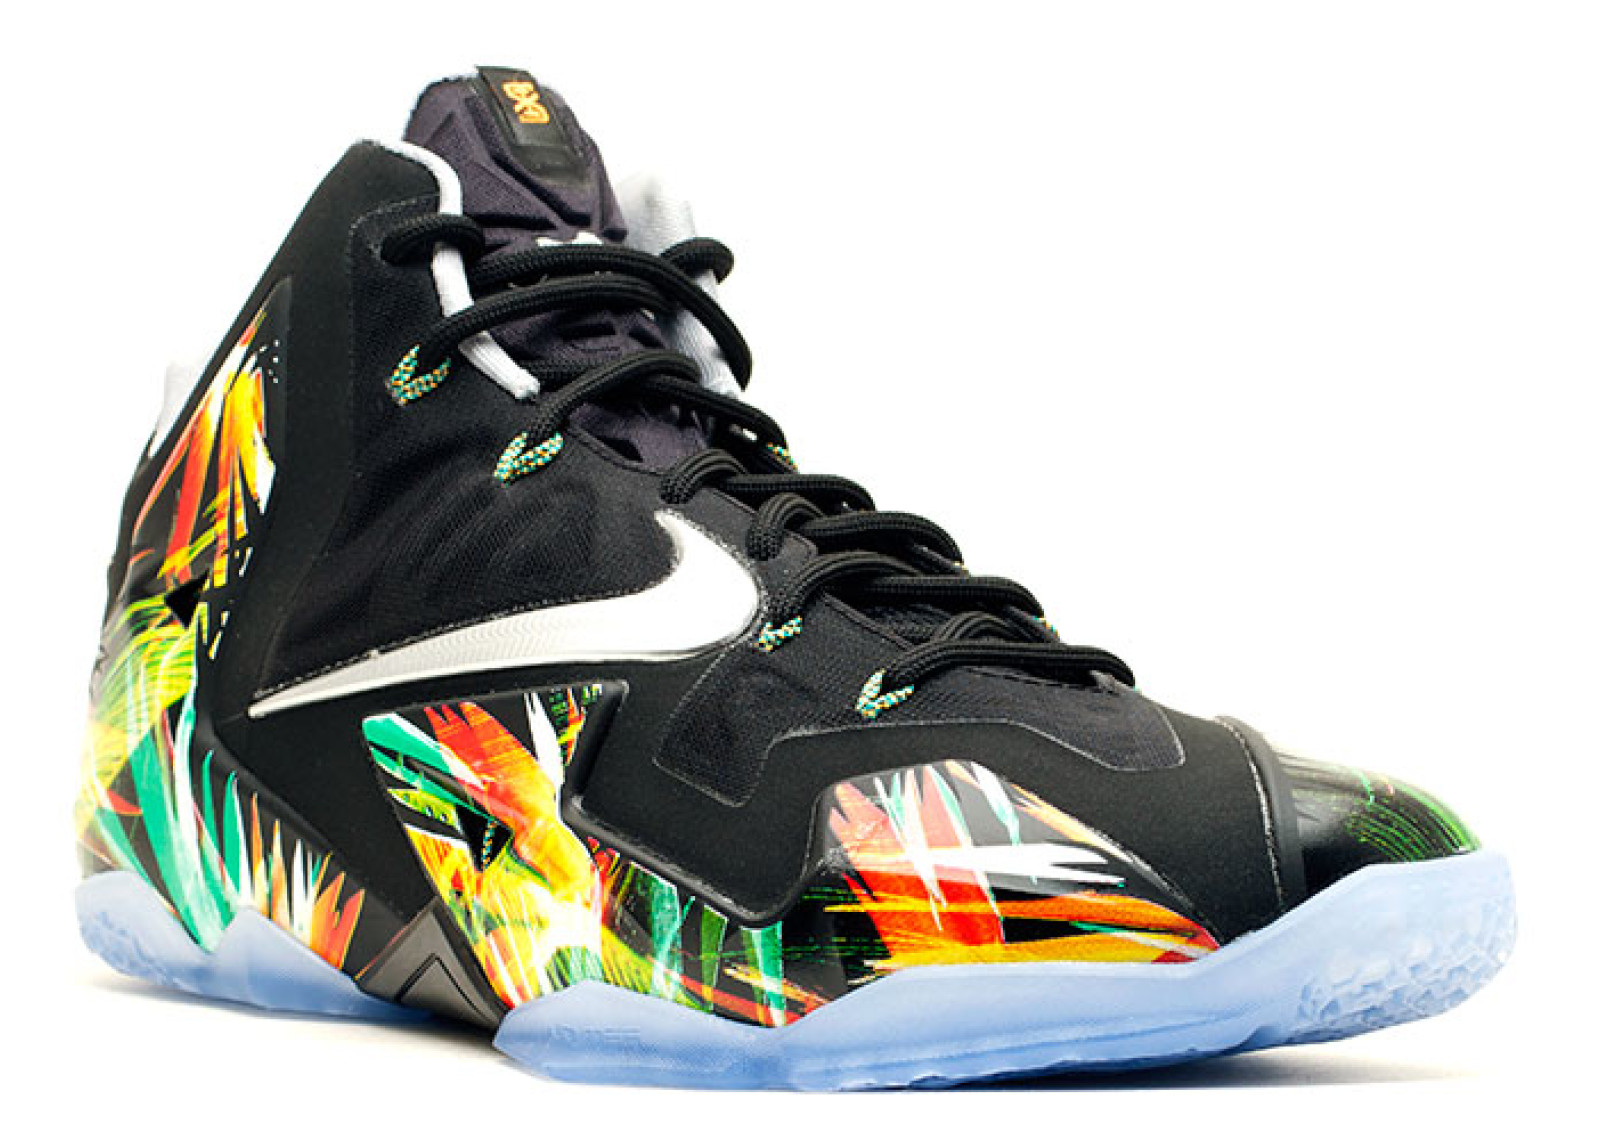 Nike - Men - Lebron 11 'Everglades